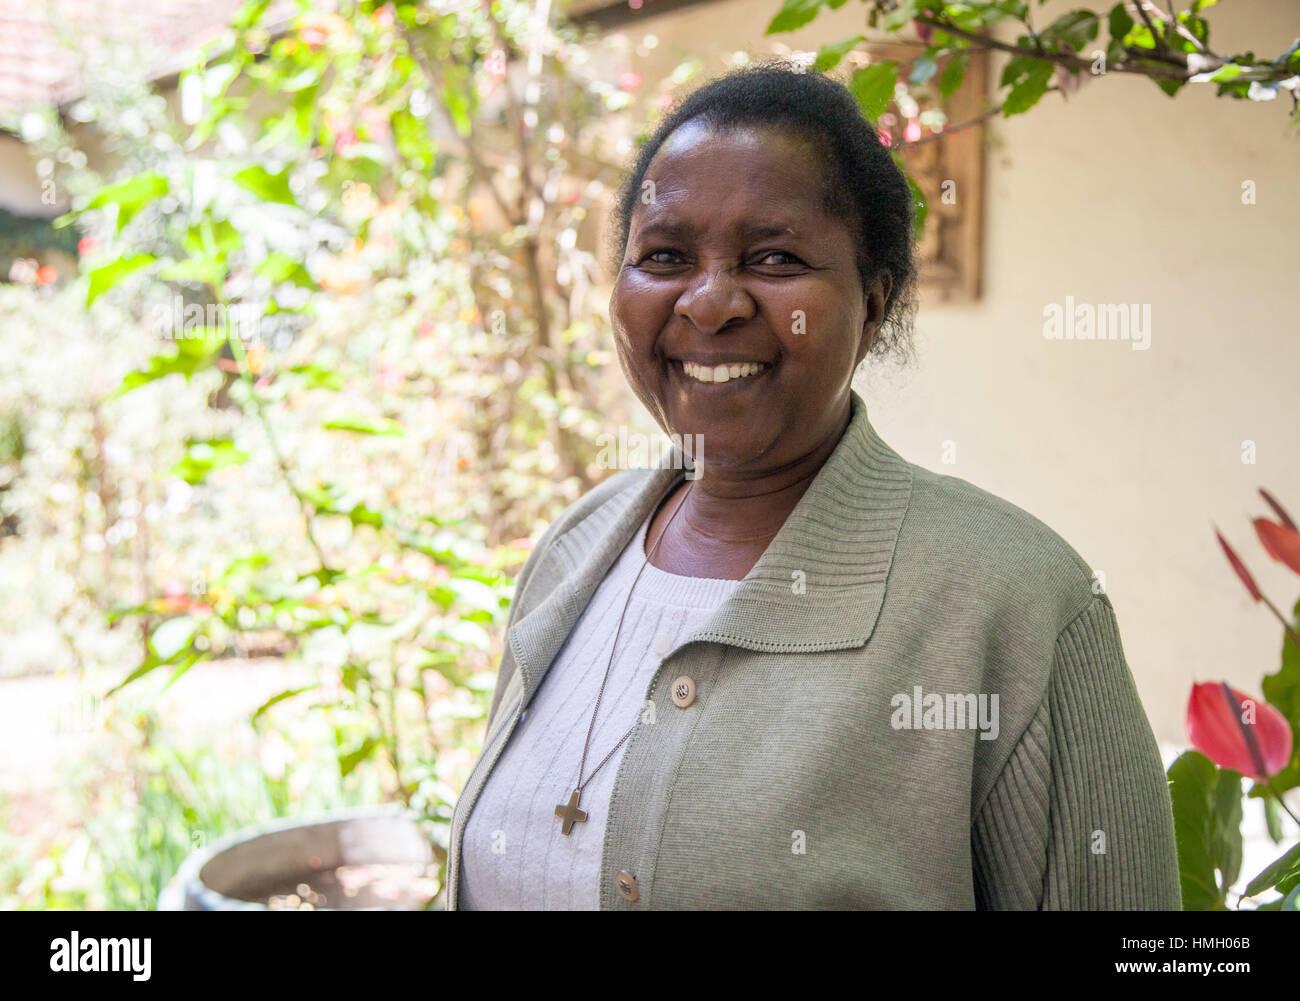 Nairobi, Kenya. 11th Jan, 2017. Ephigenia Gachiri stands in the Catholic Loreto abbey in Nairobi, Kenya, 11 January - Stock Image